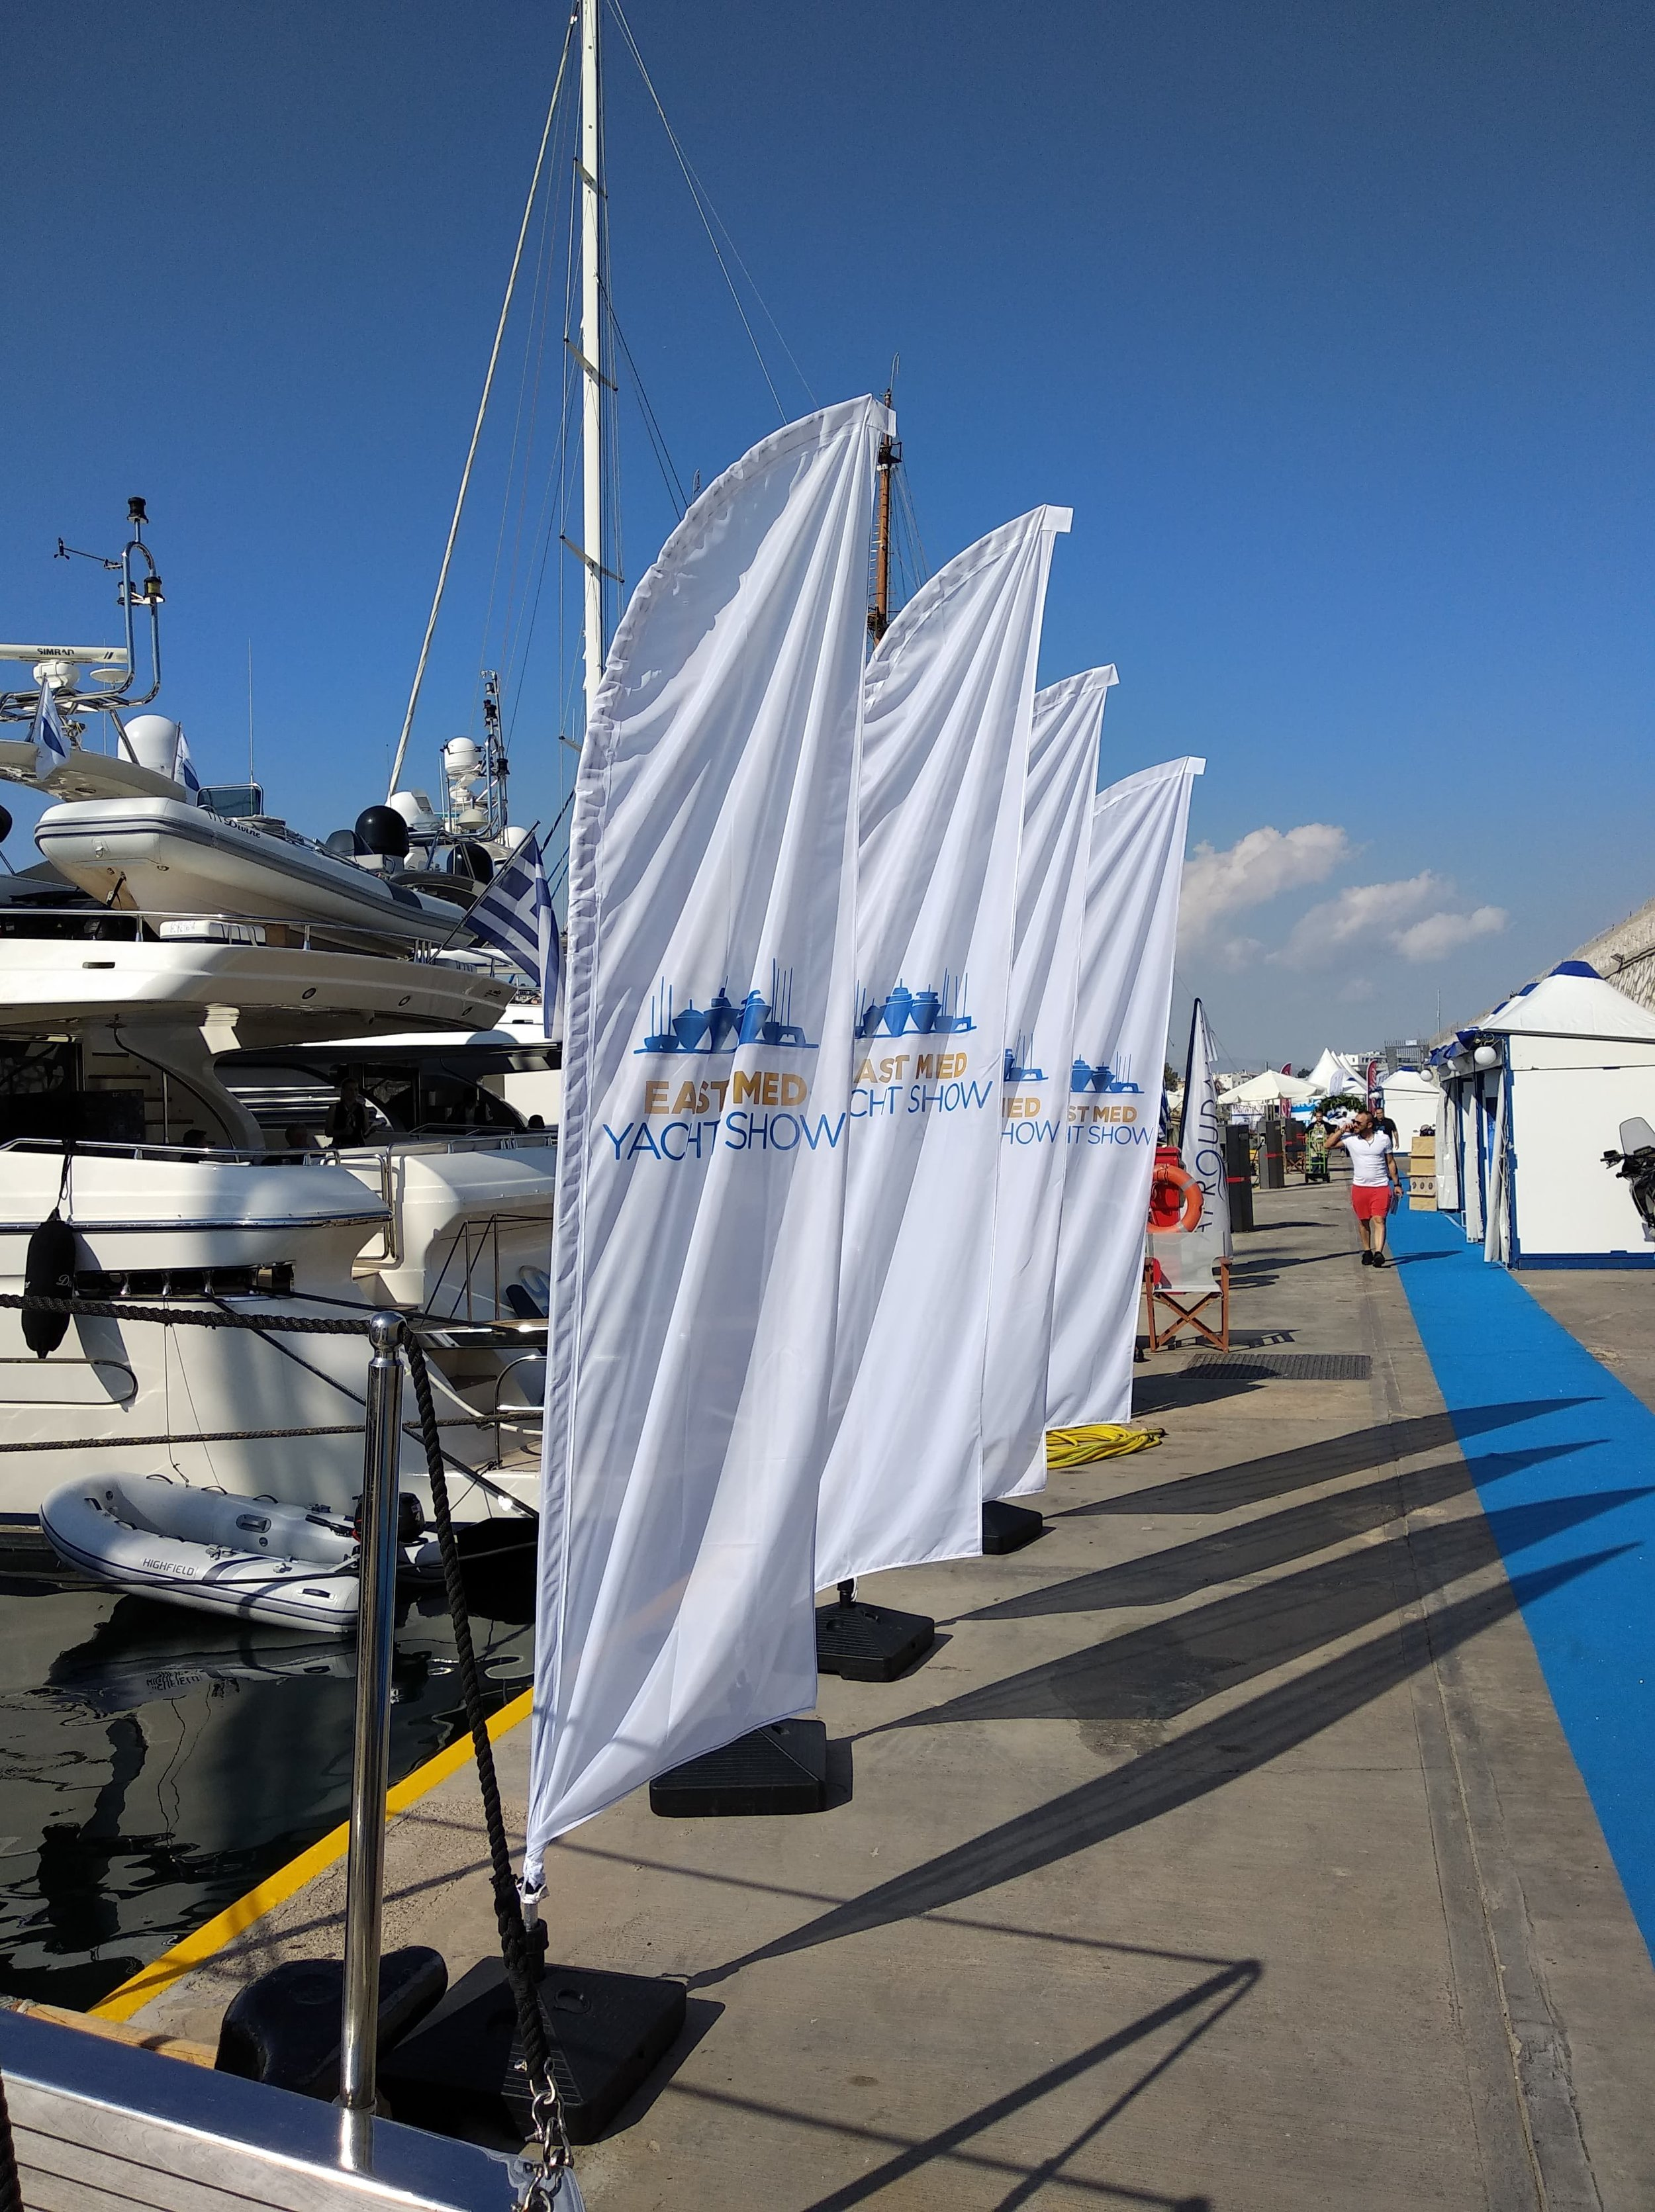 East Med Yacht Show.jpg